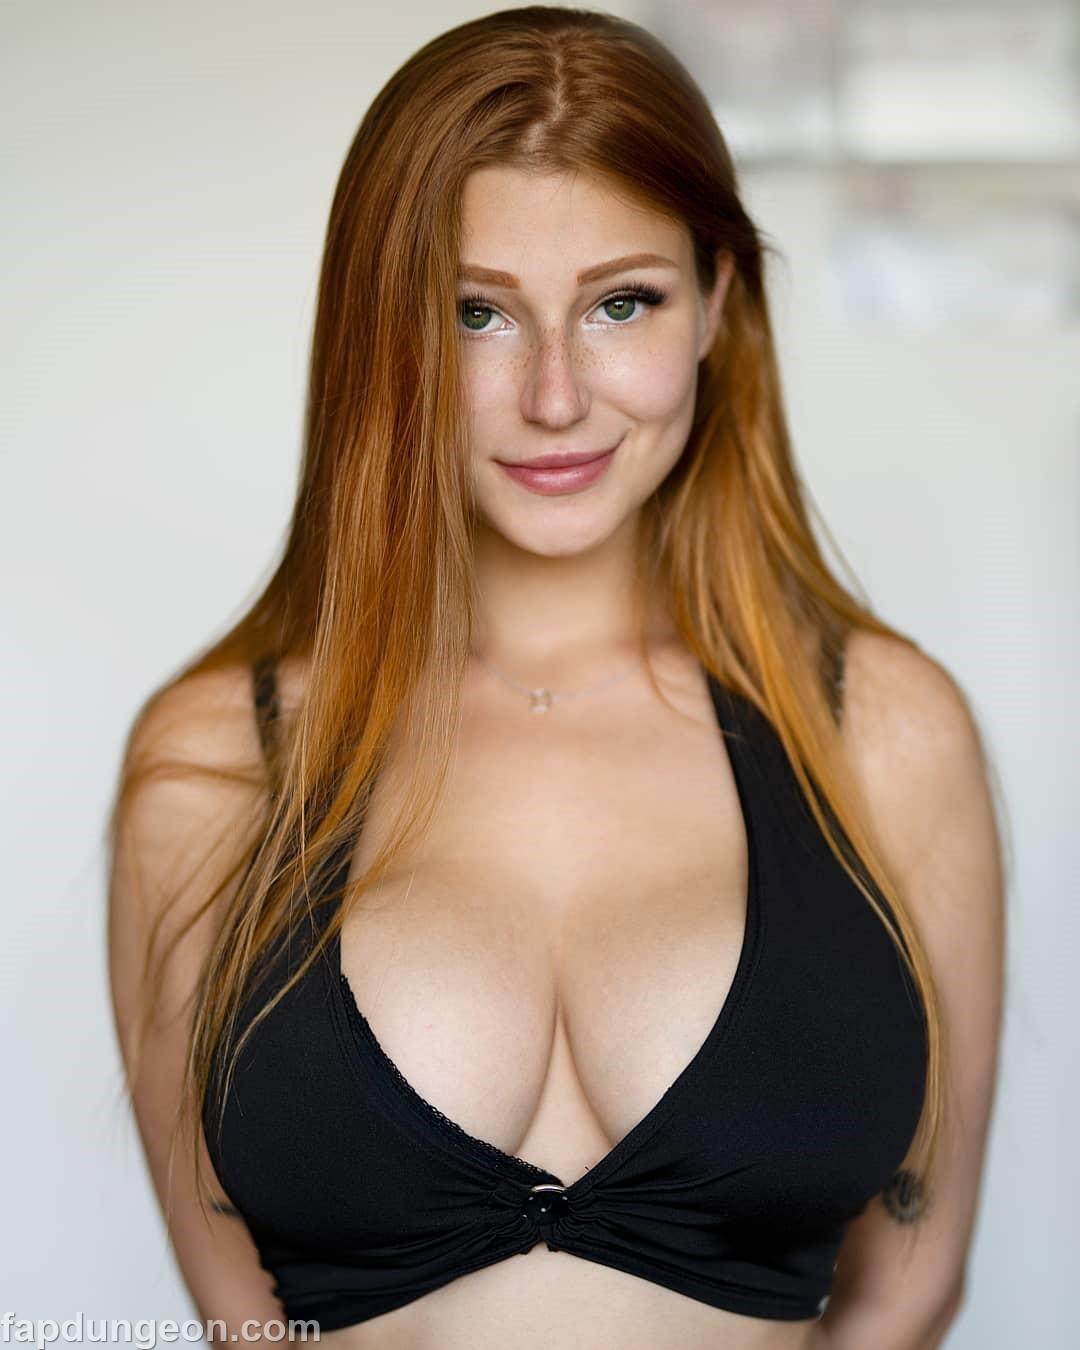 Katerina.soria Onlyfans